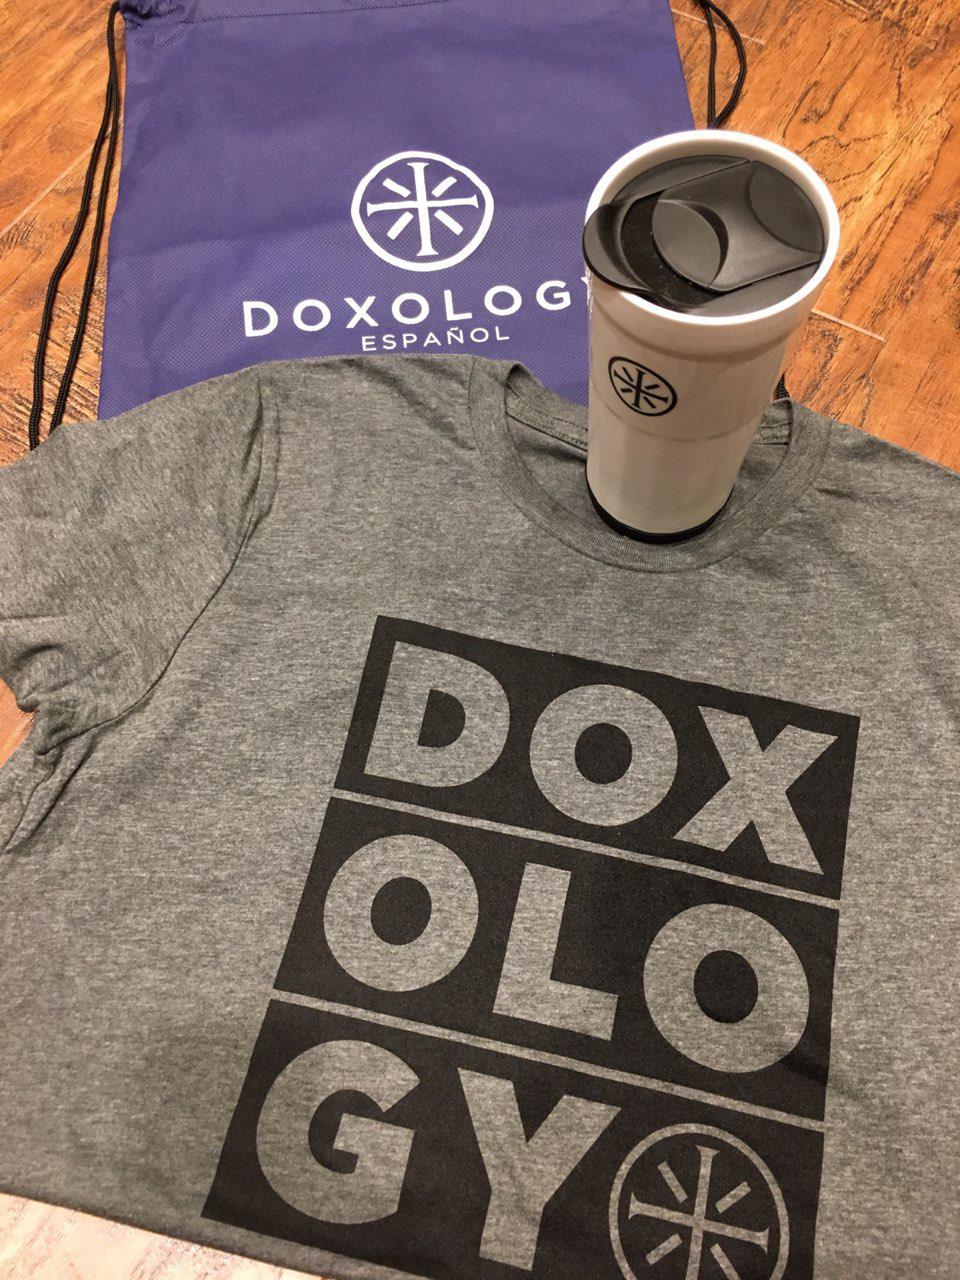 Doxology en Español image 3